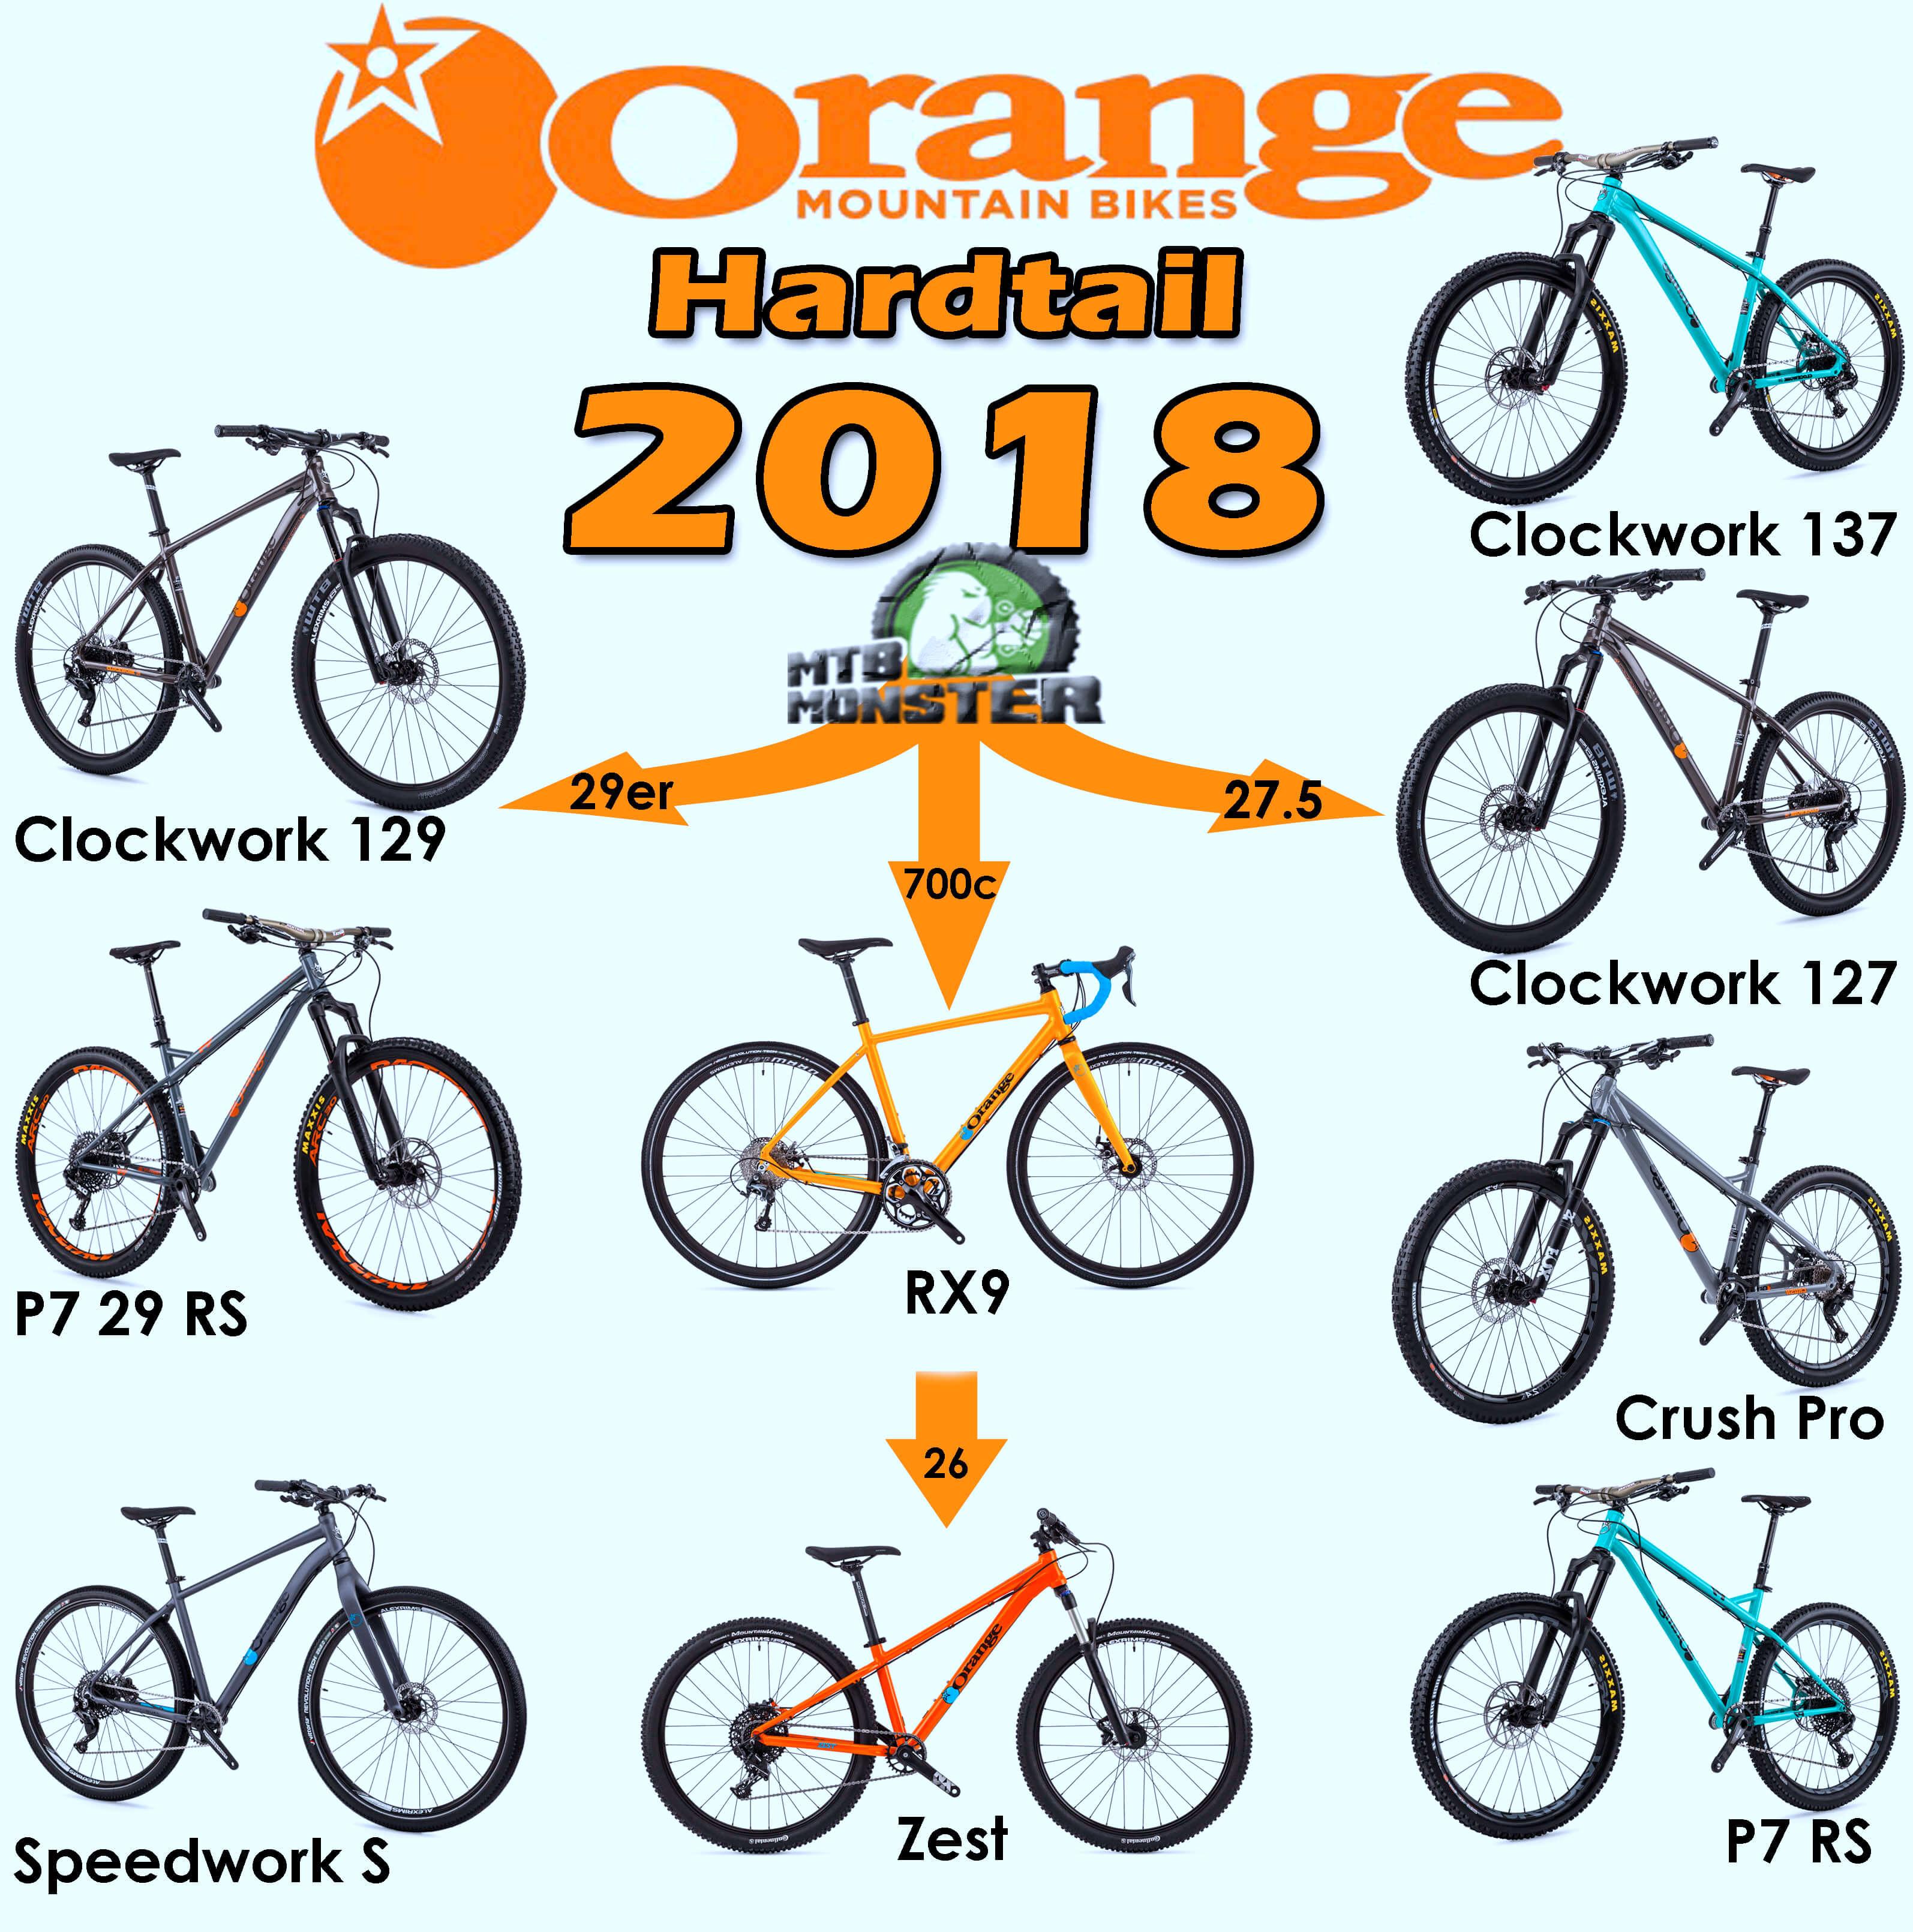 orange-bikes-2018-hardtail-range-and-information-and-guide-uk-dealer-mtb-monster-1.jpg